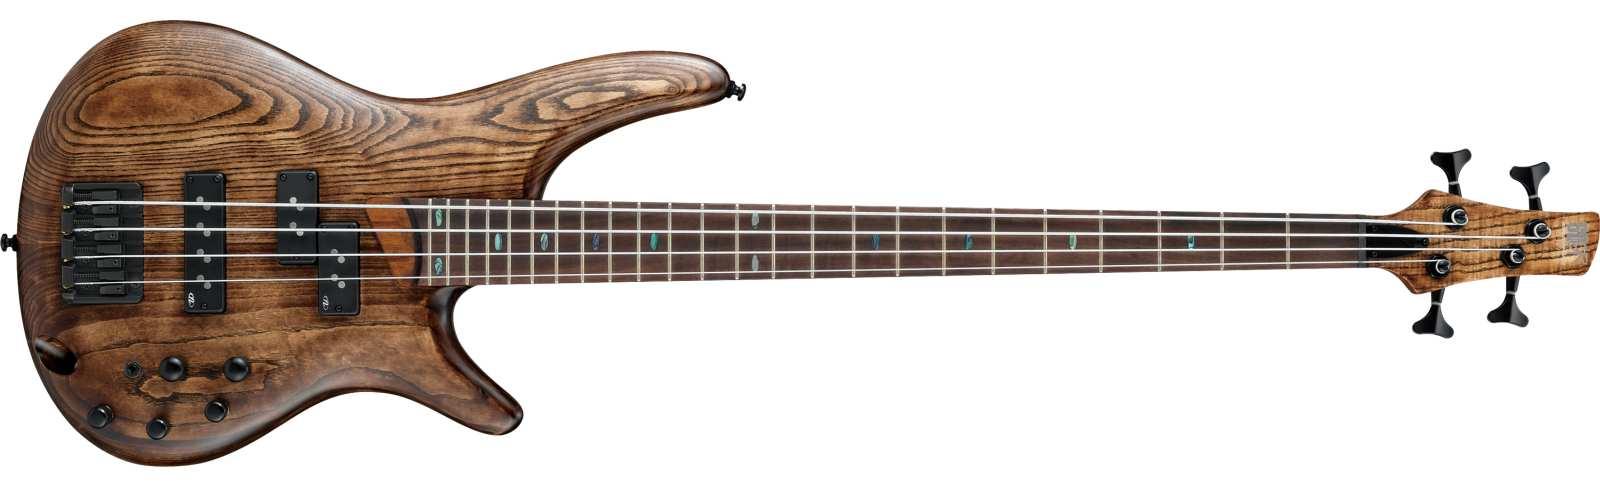 Ibanez SR650E-ABS E-Bass